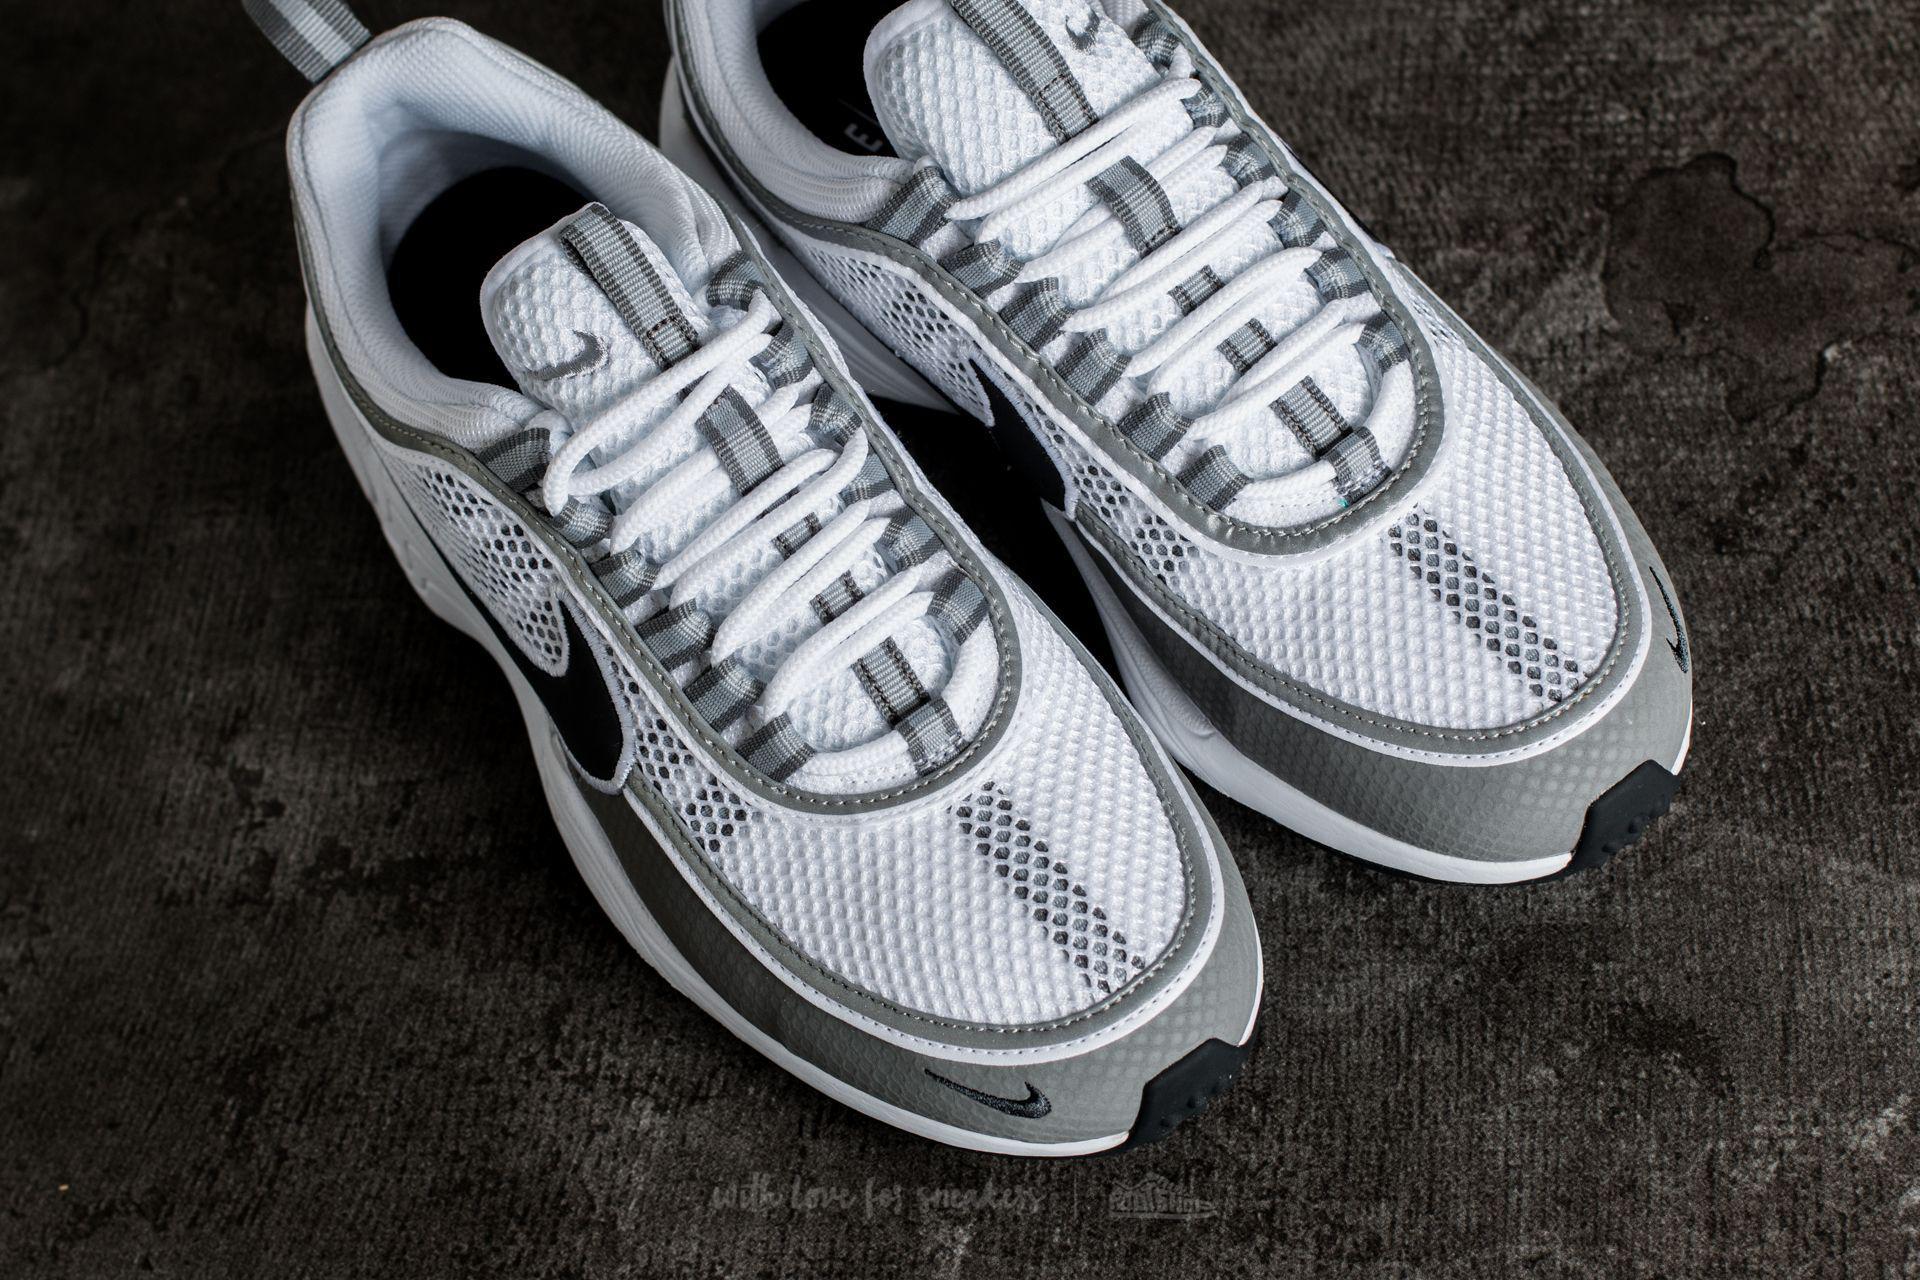 Nike Air Zoom Spiridon White/ Black